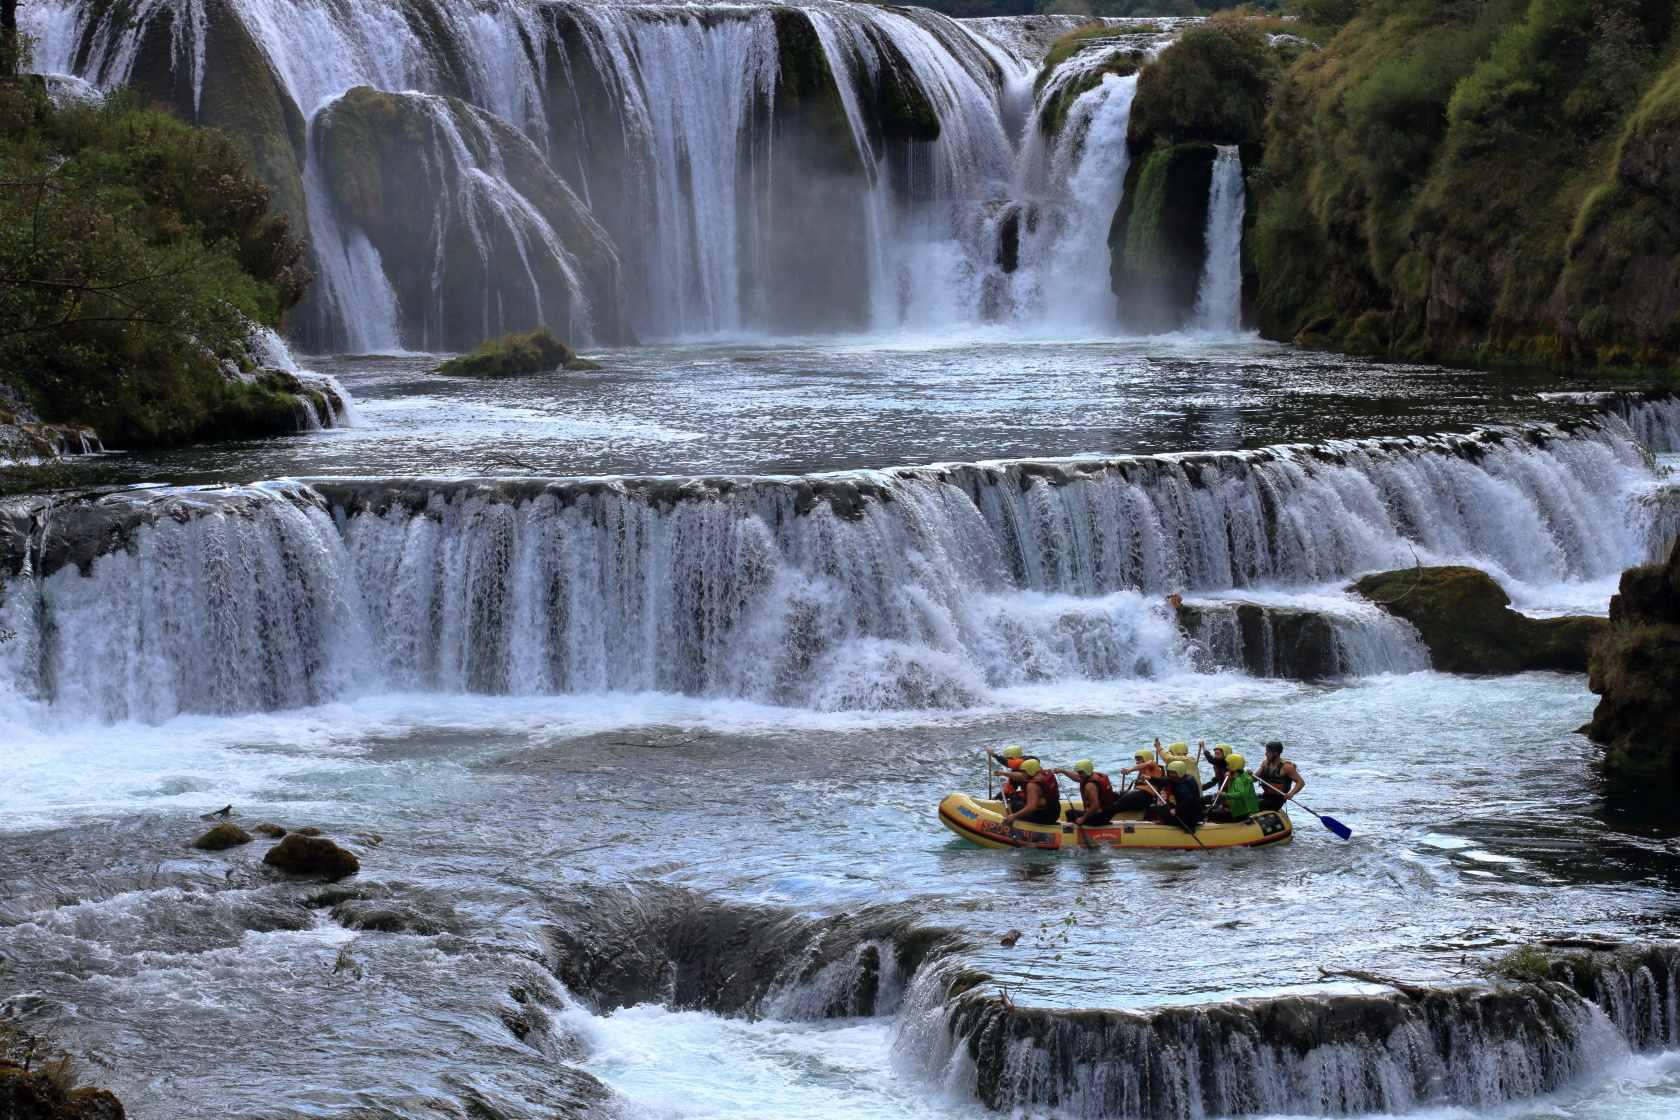 Strbacki buk, slapovi na reki Uni